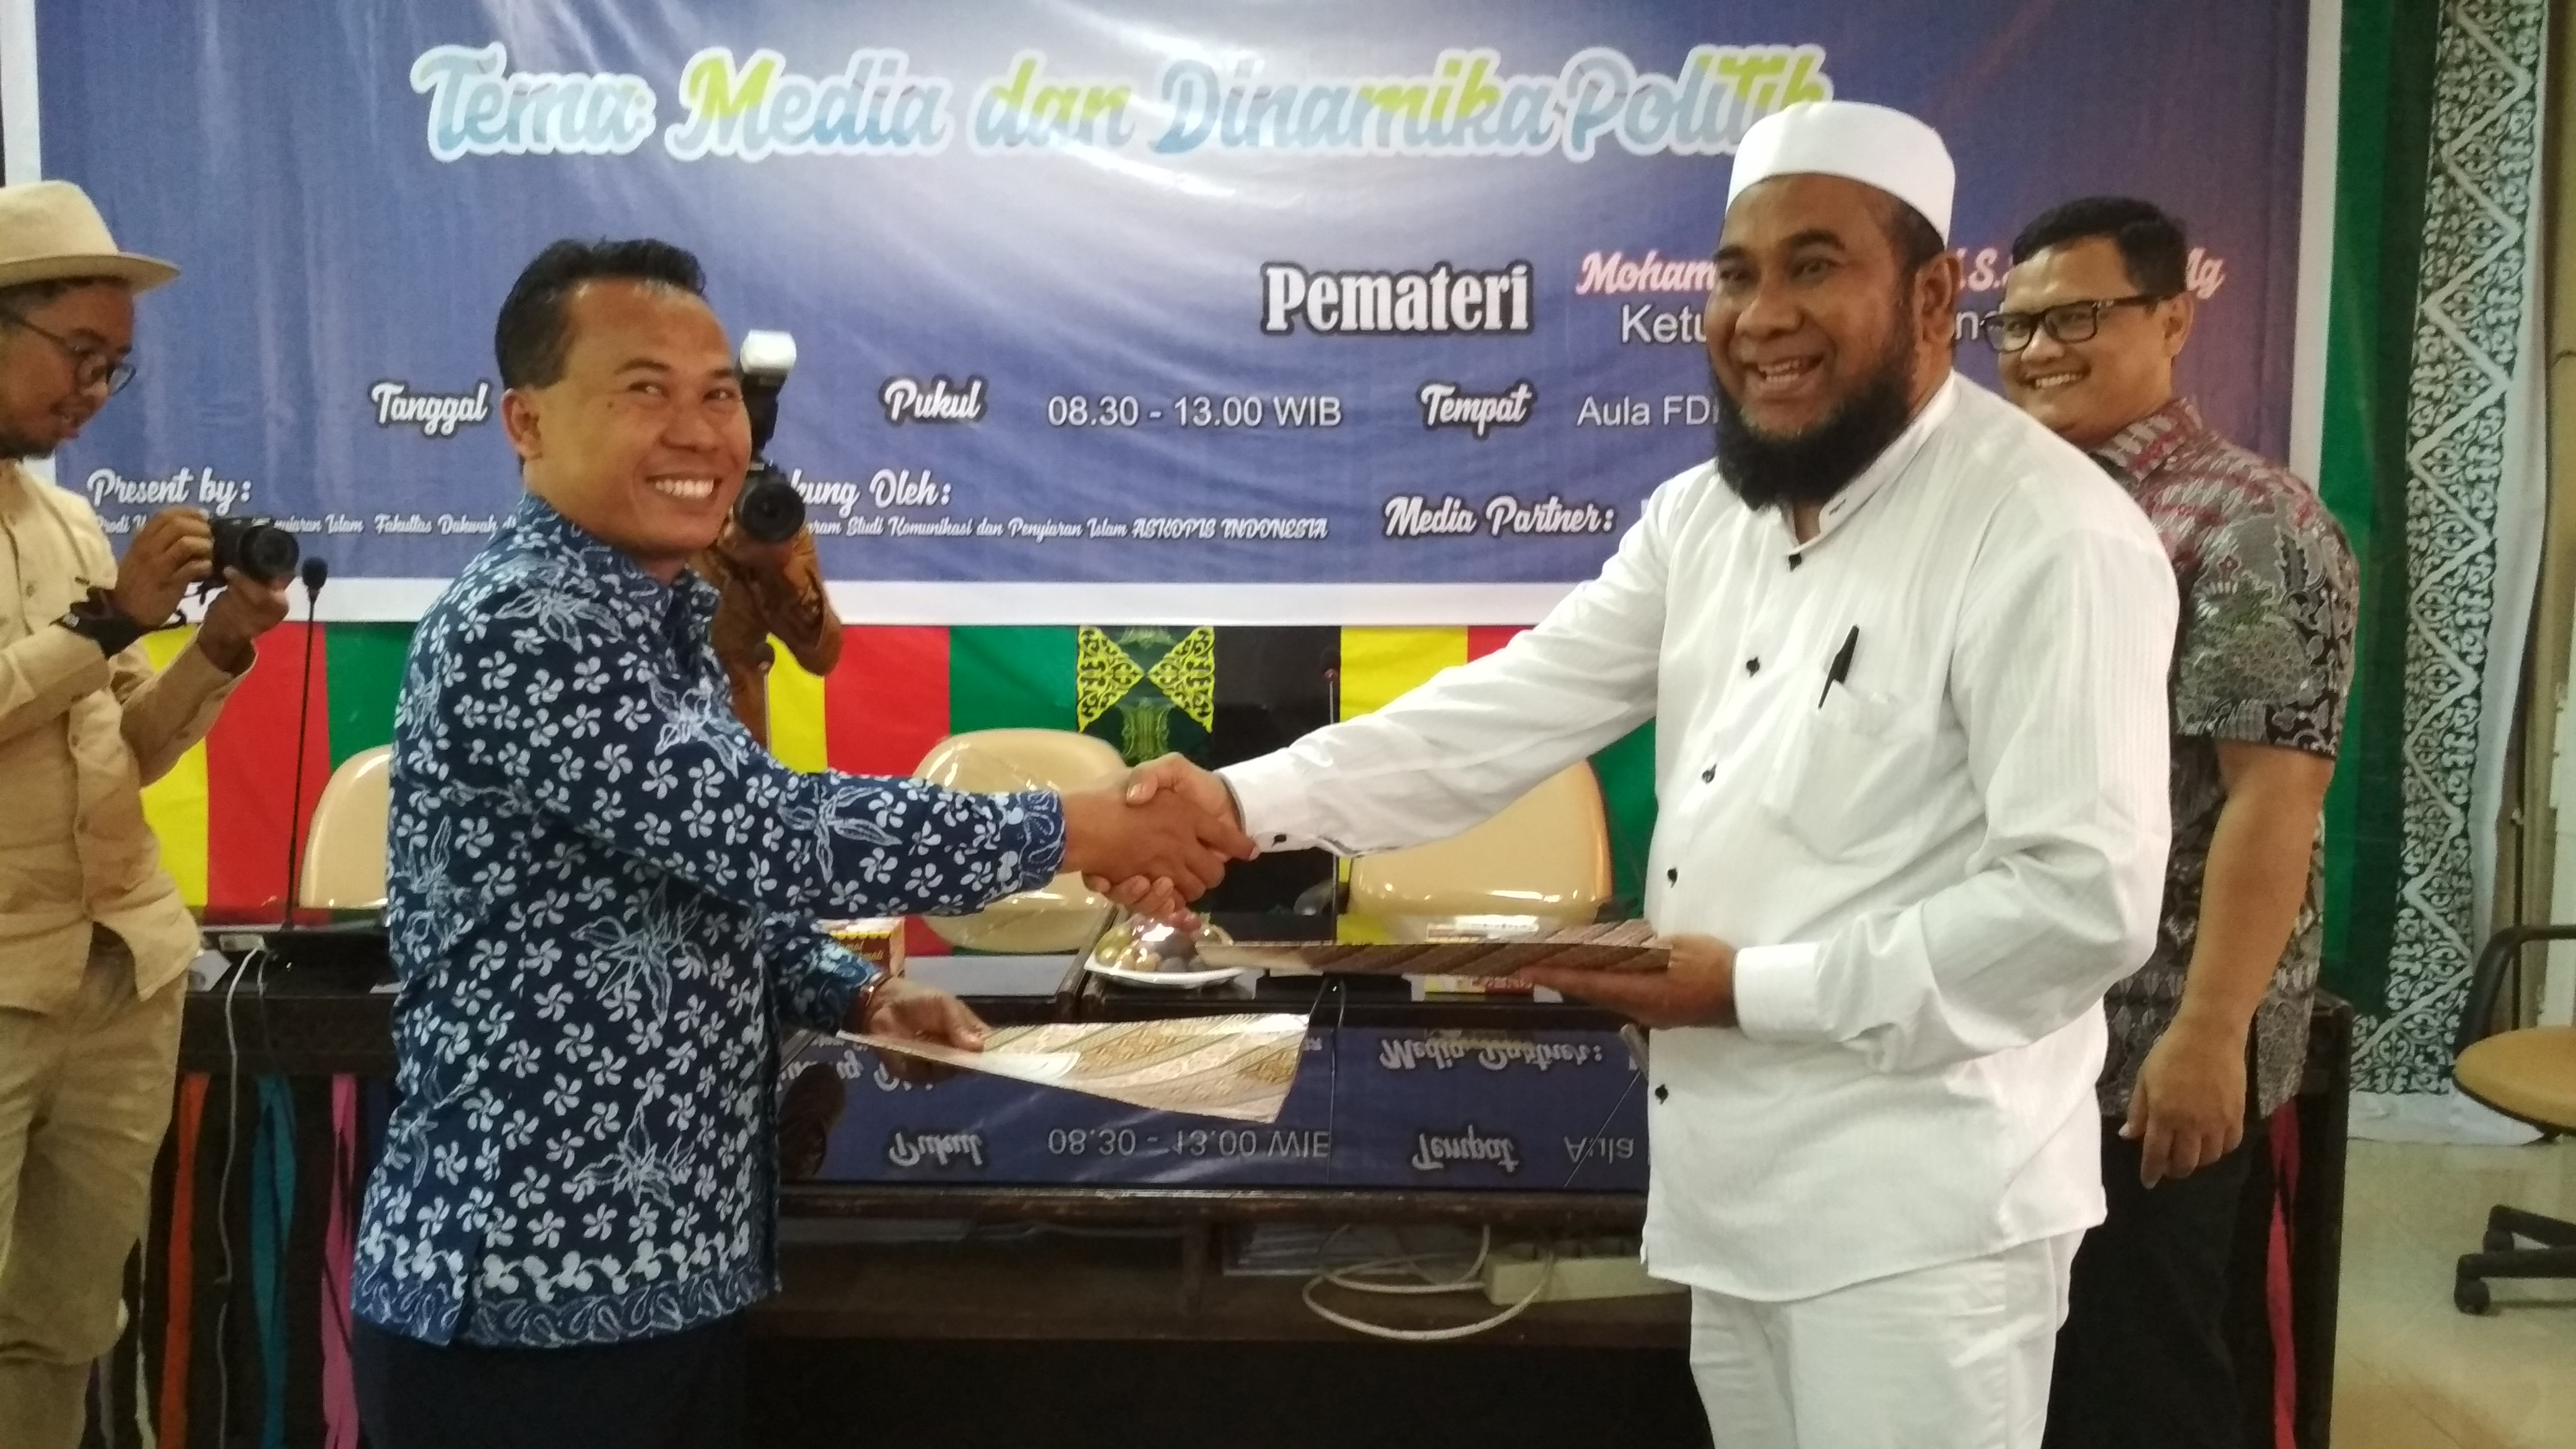 Ketua Askopis Indonesia: Media Dikuasai Segelintir Orang Saja